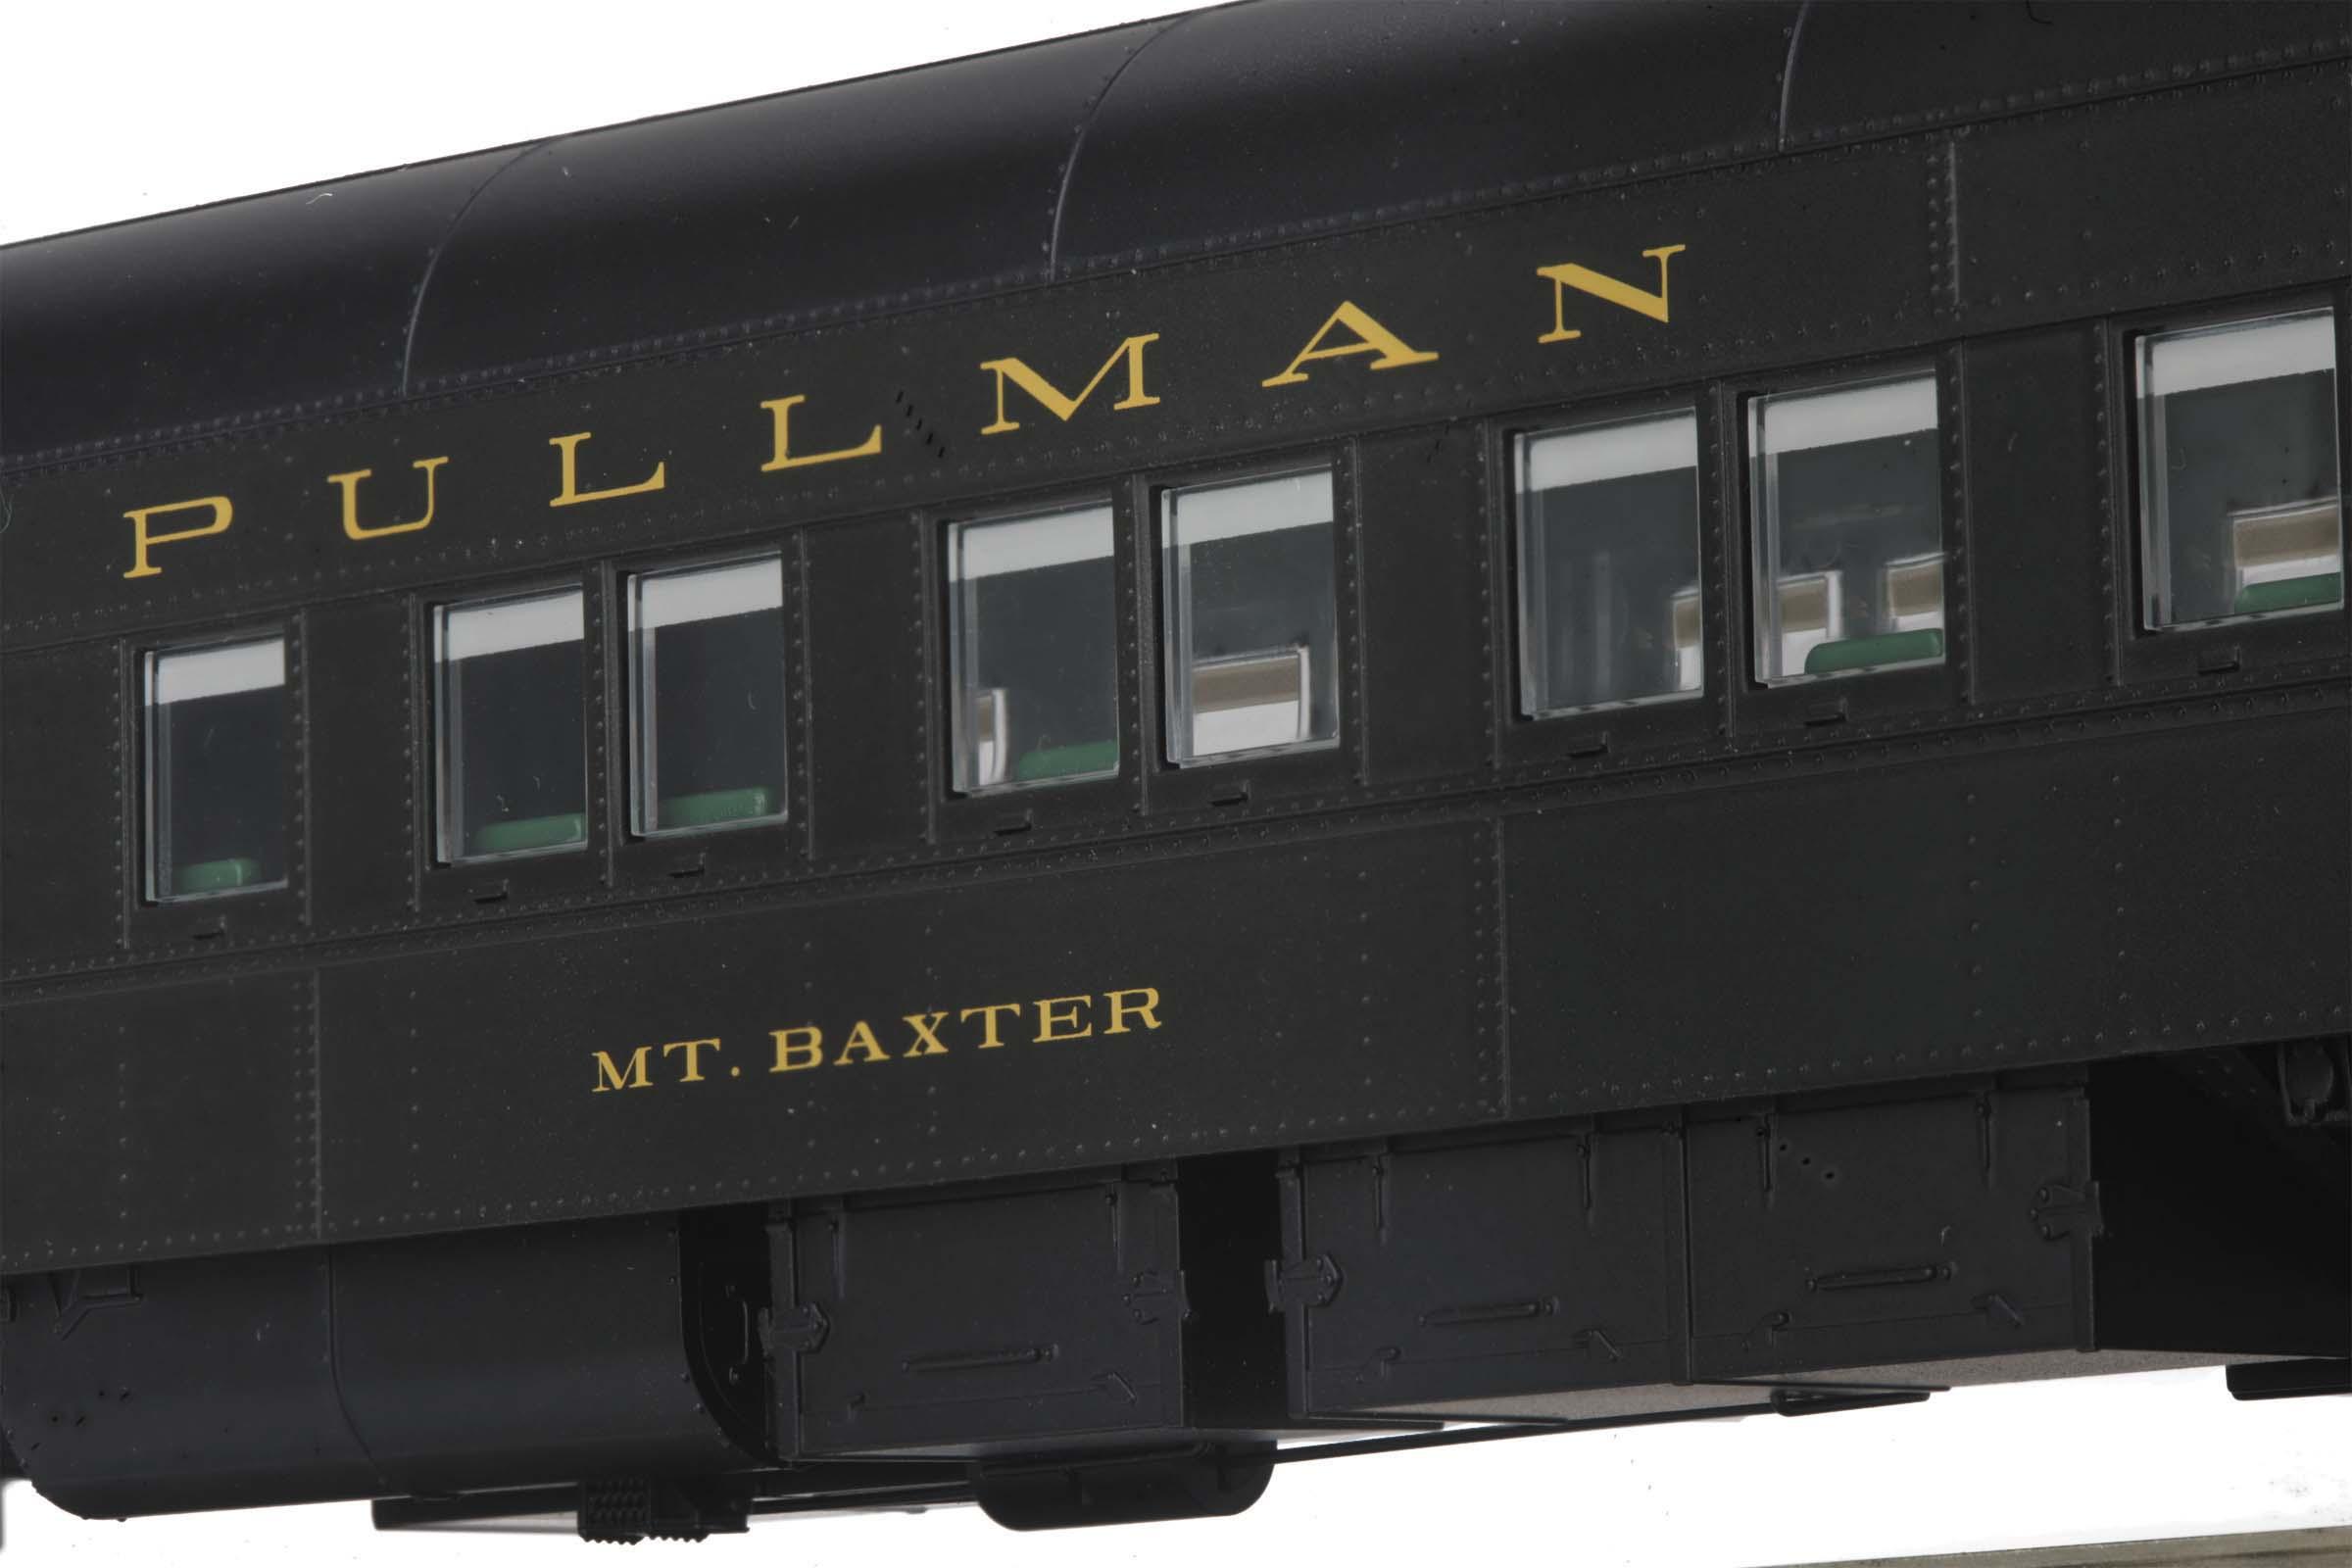 mth ho spotlight ho heavyweight passenger sets arrive mth electric trains. Black Bedroom Furniture Sets. Home Design Ideas